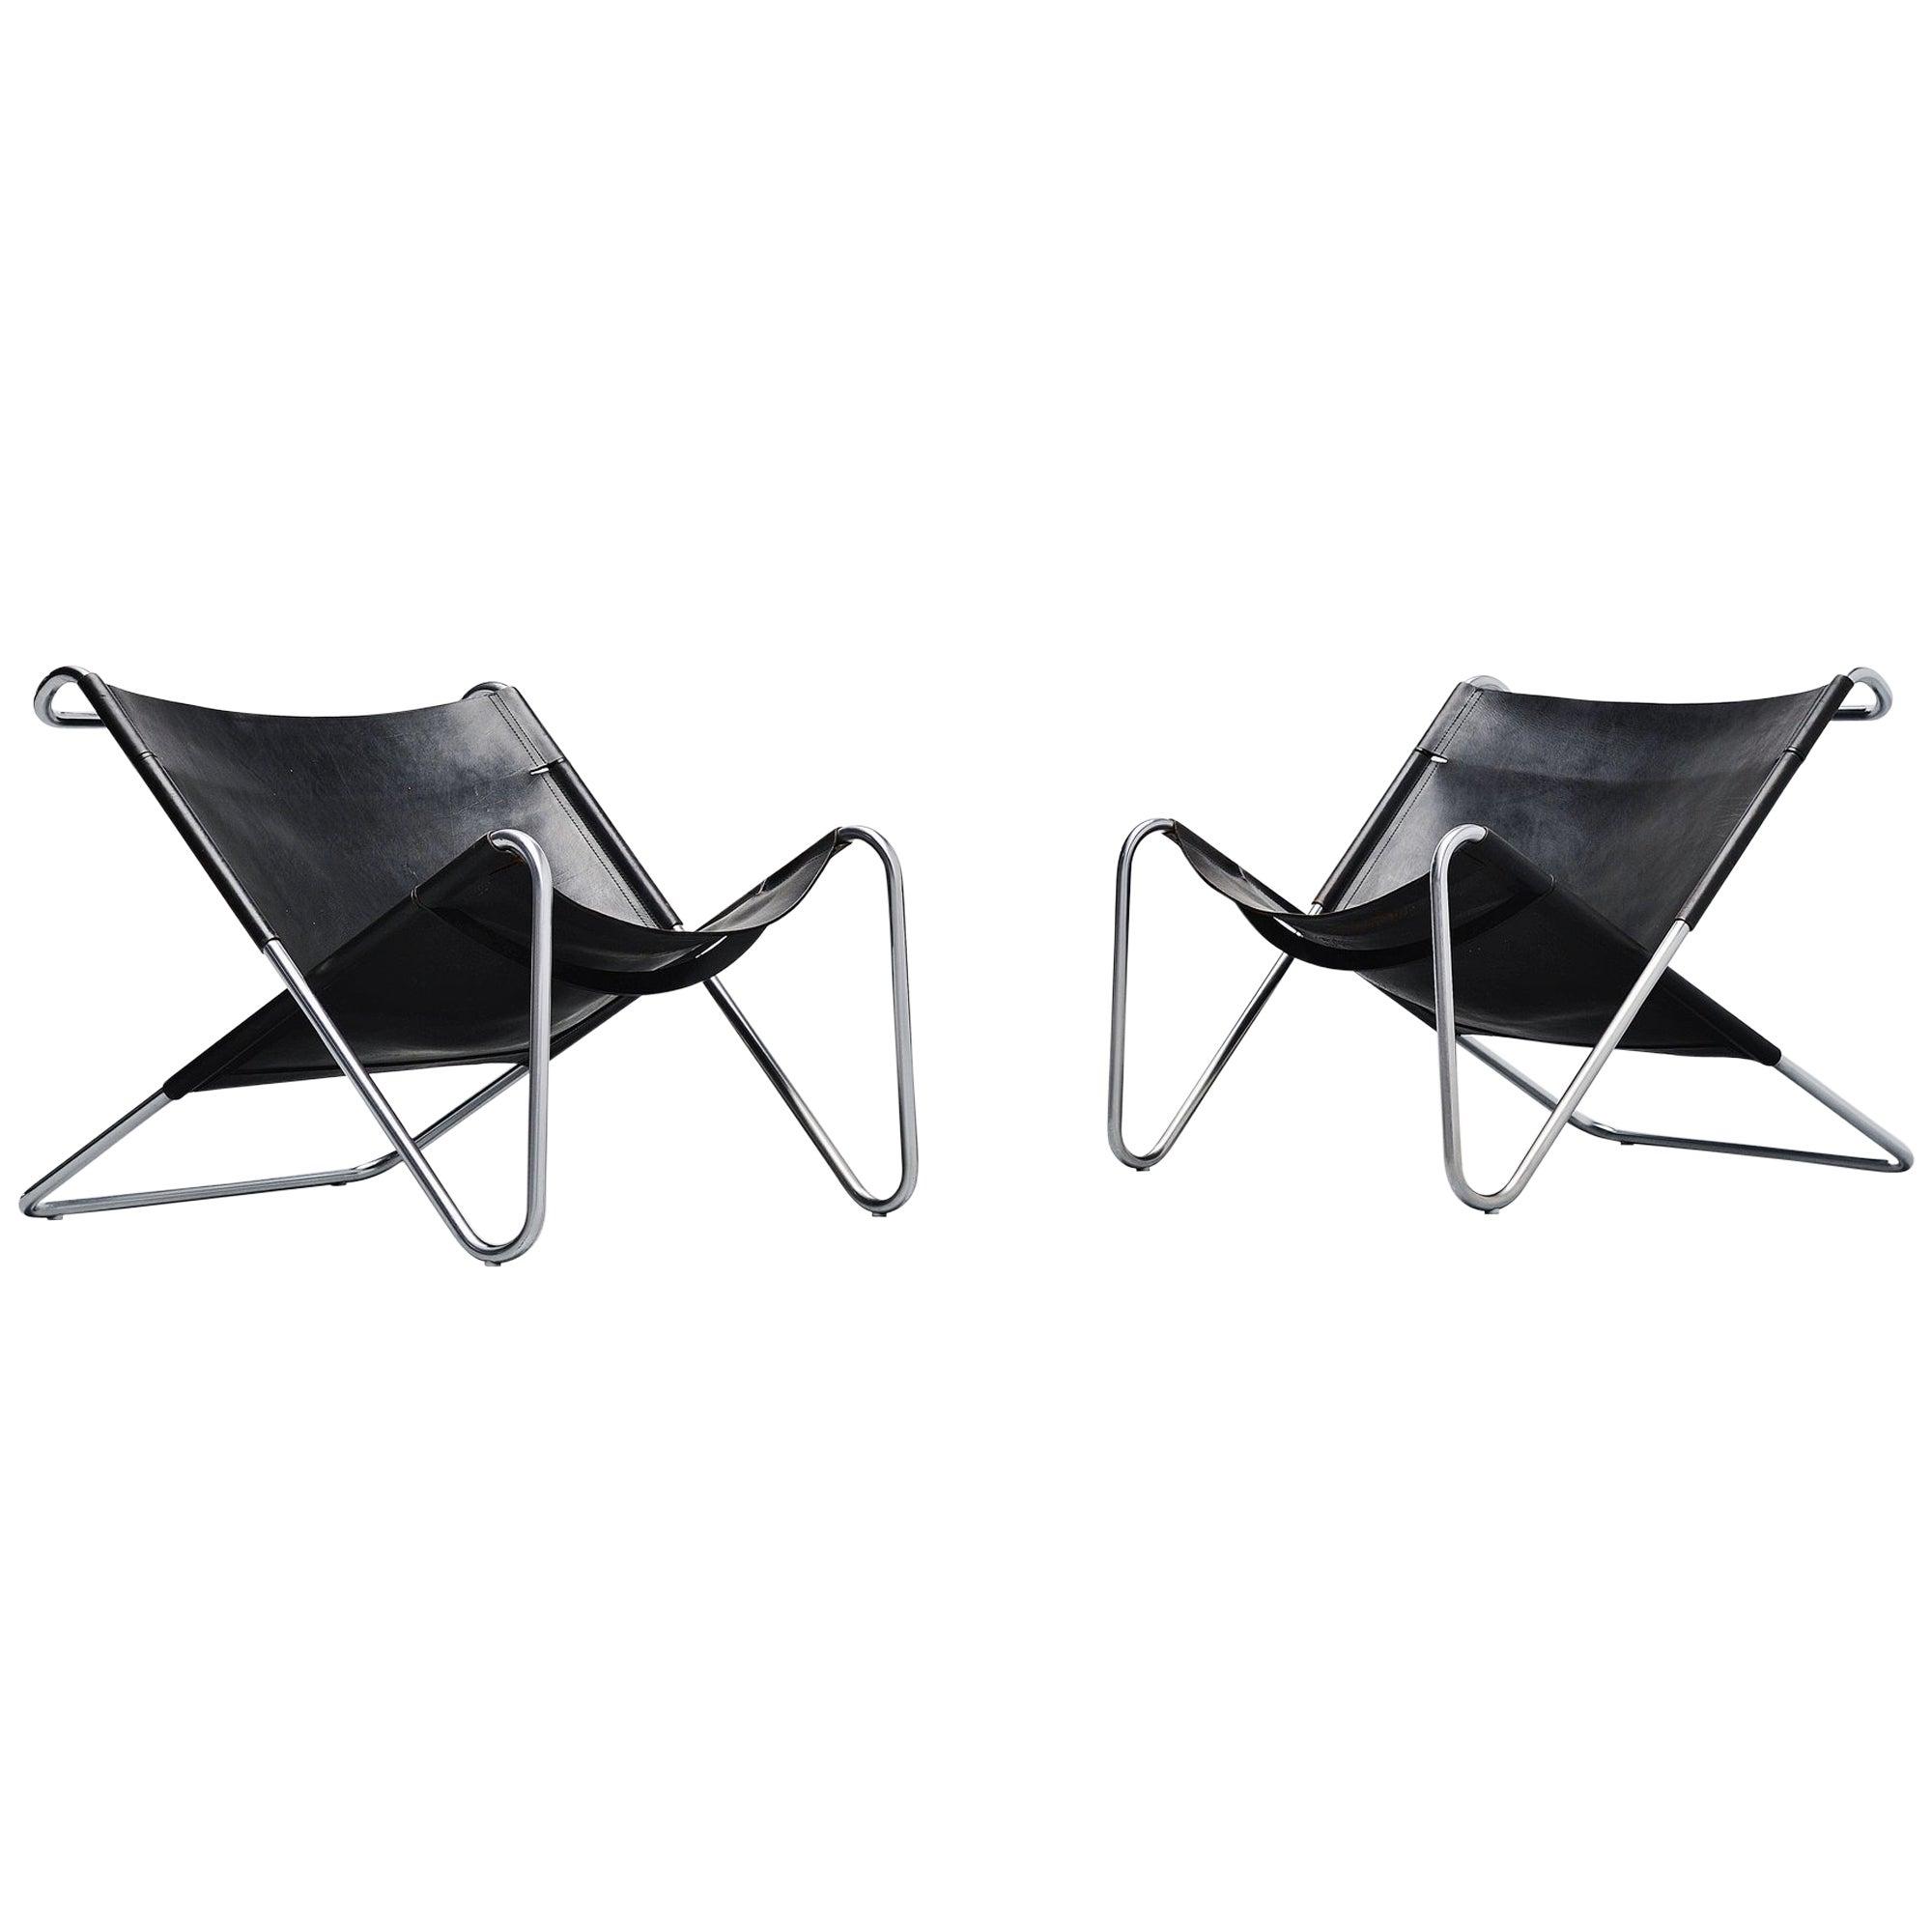 Kwok Hoi Chan Lounge Chairs SZ15 'T Spectrum, 1973